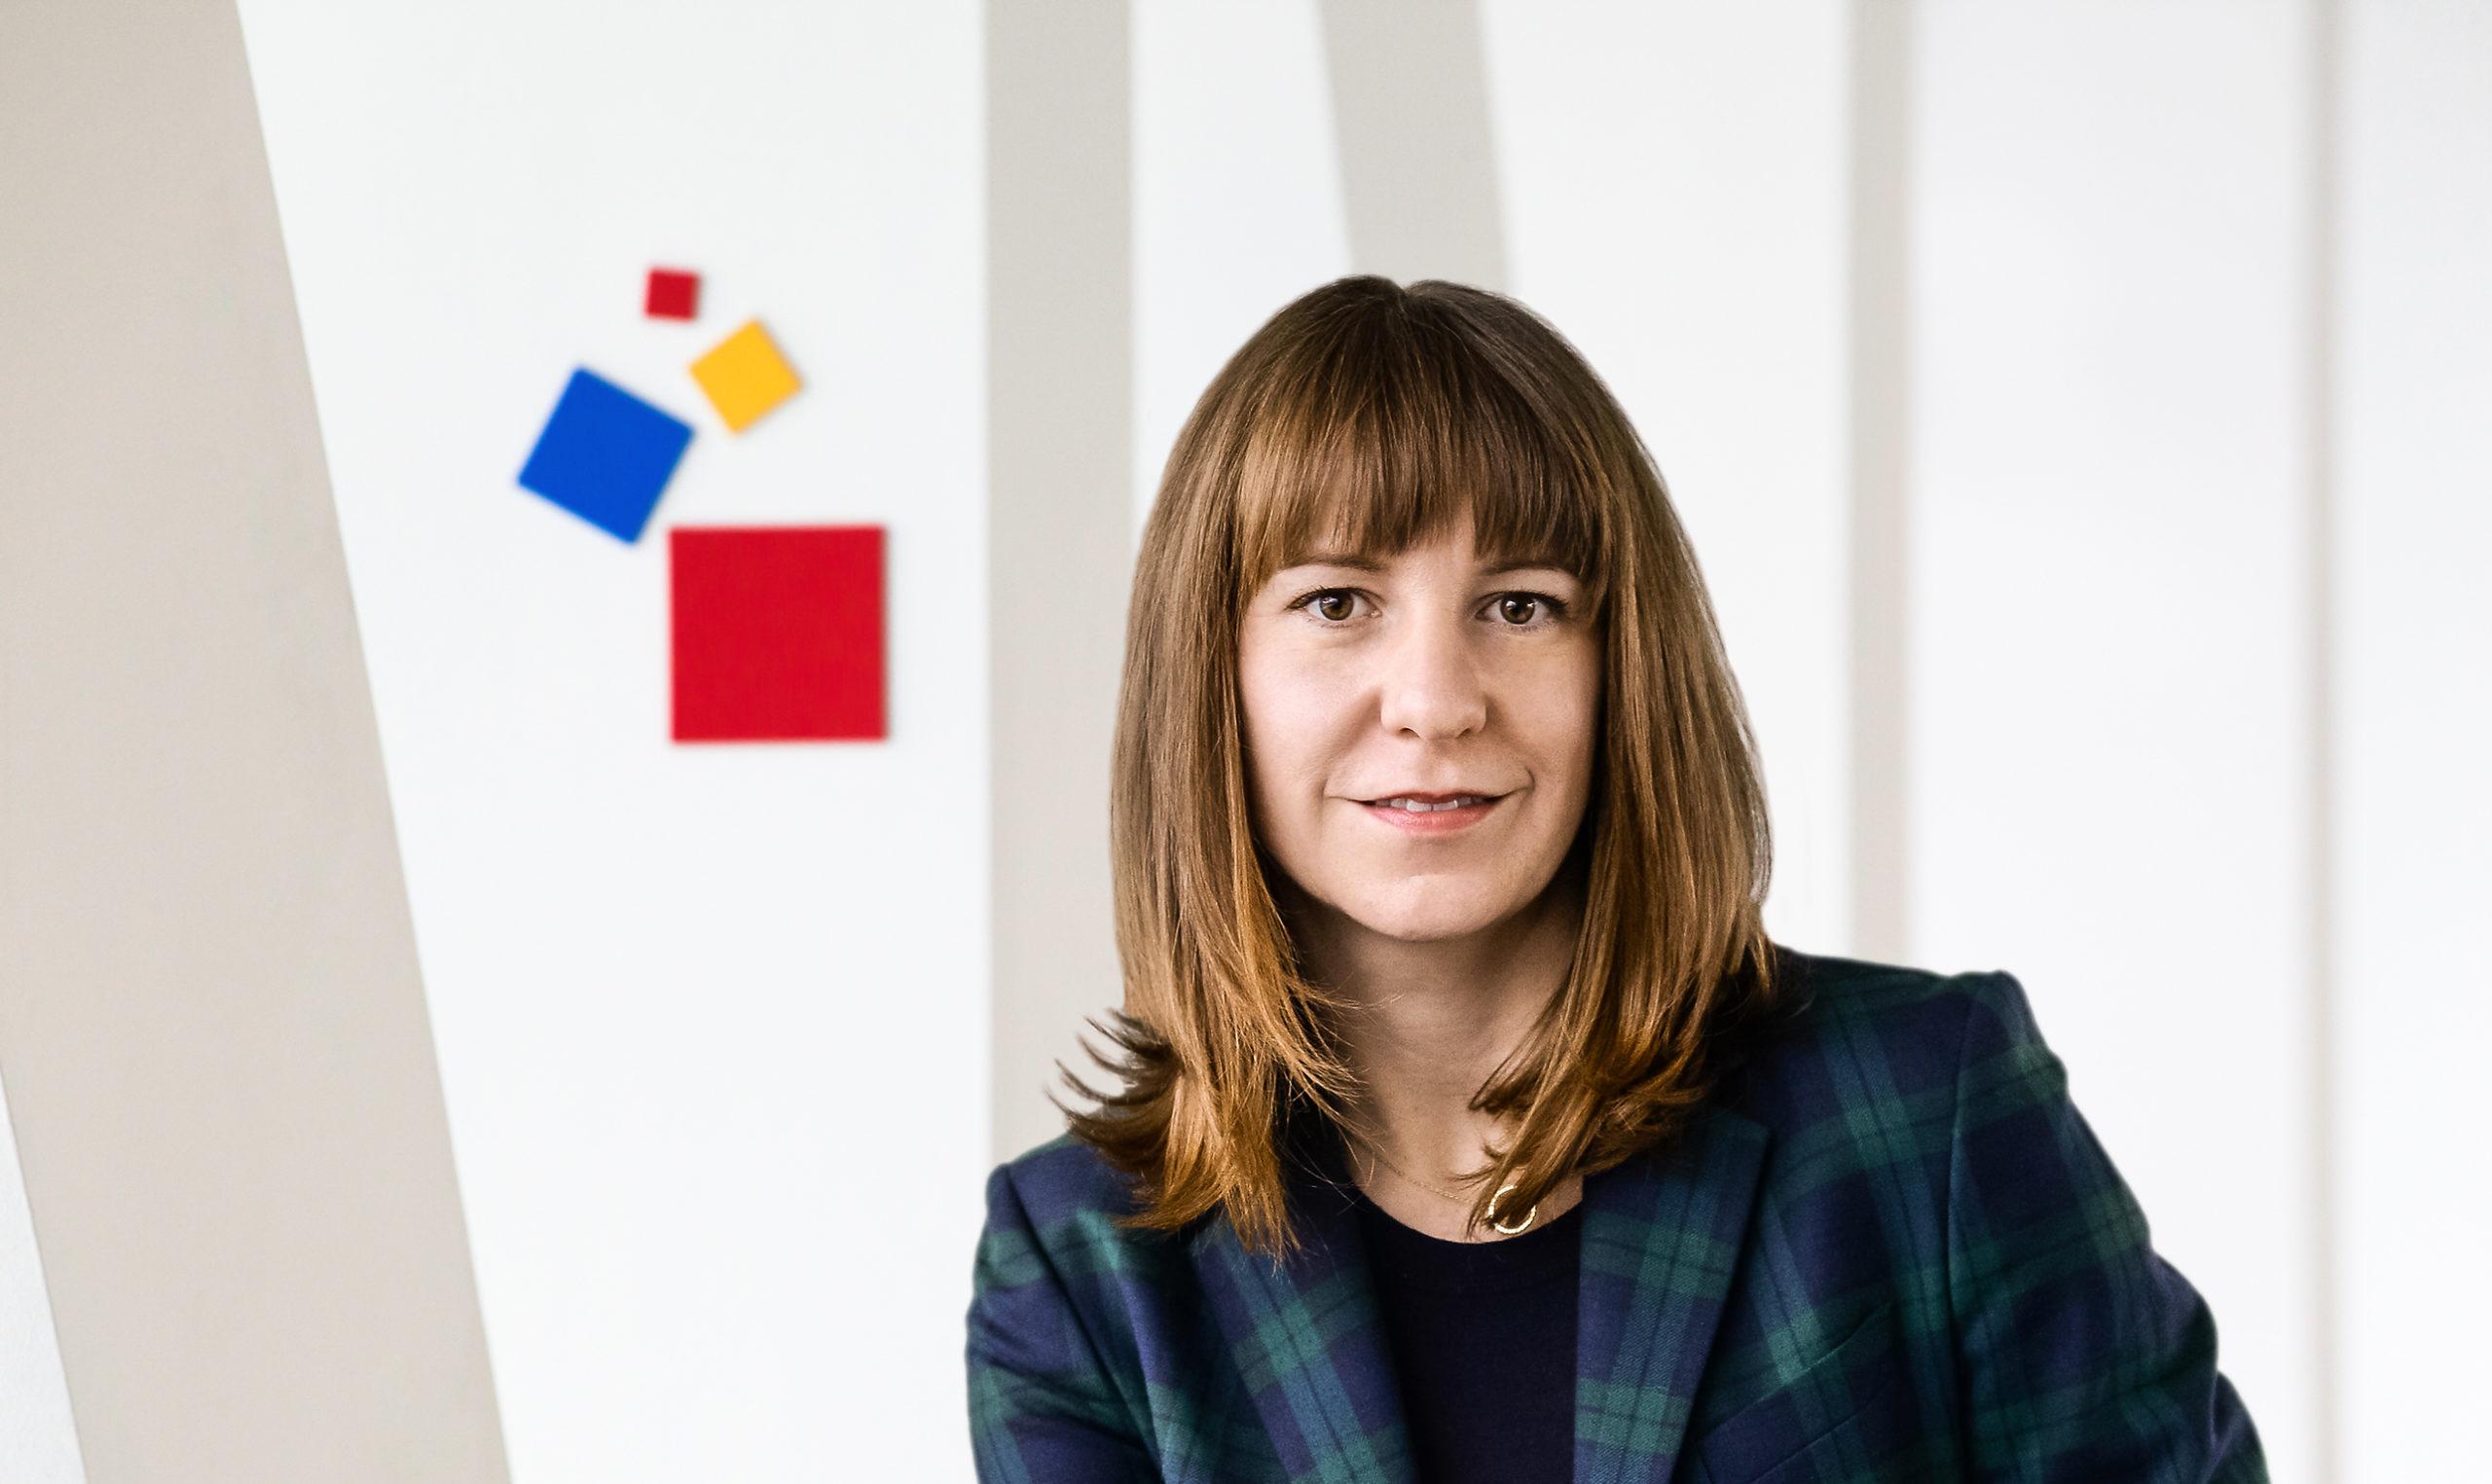 Julia Uherek (Foto: Messe Frankfurt/Pietro Sutera)